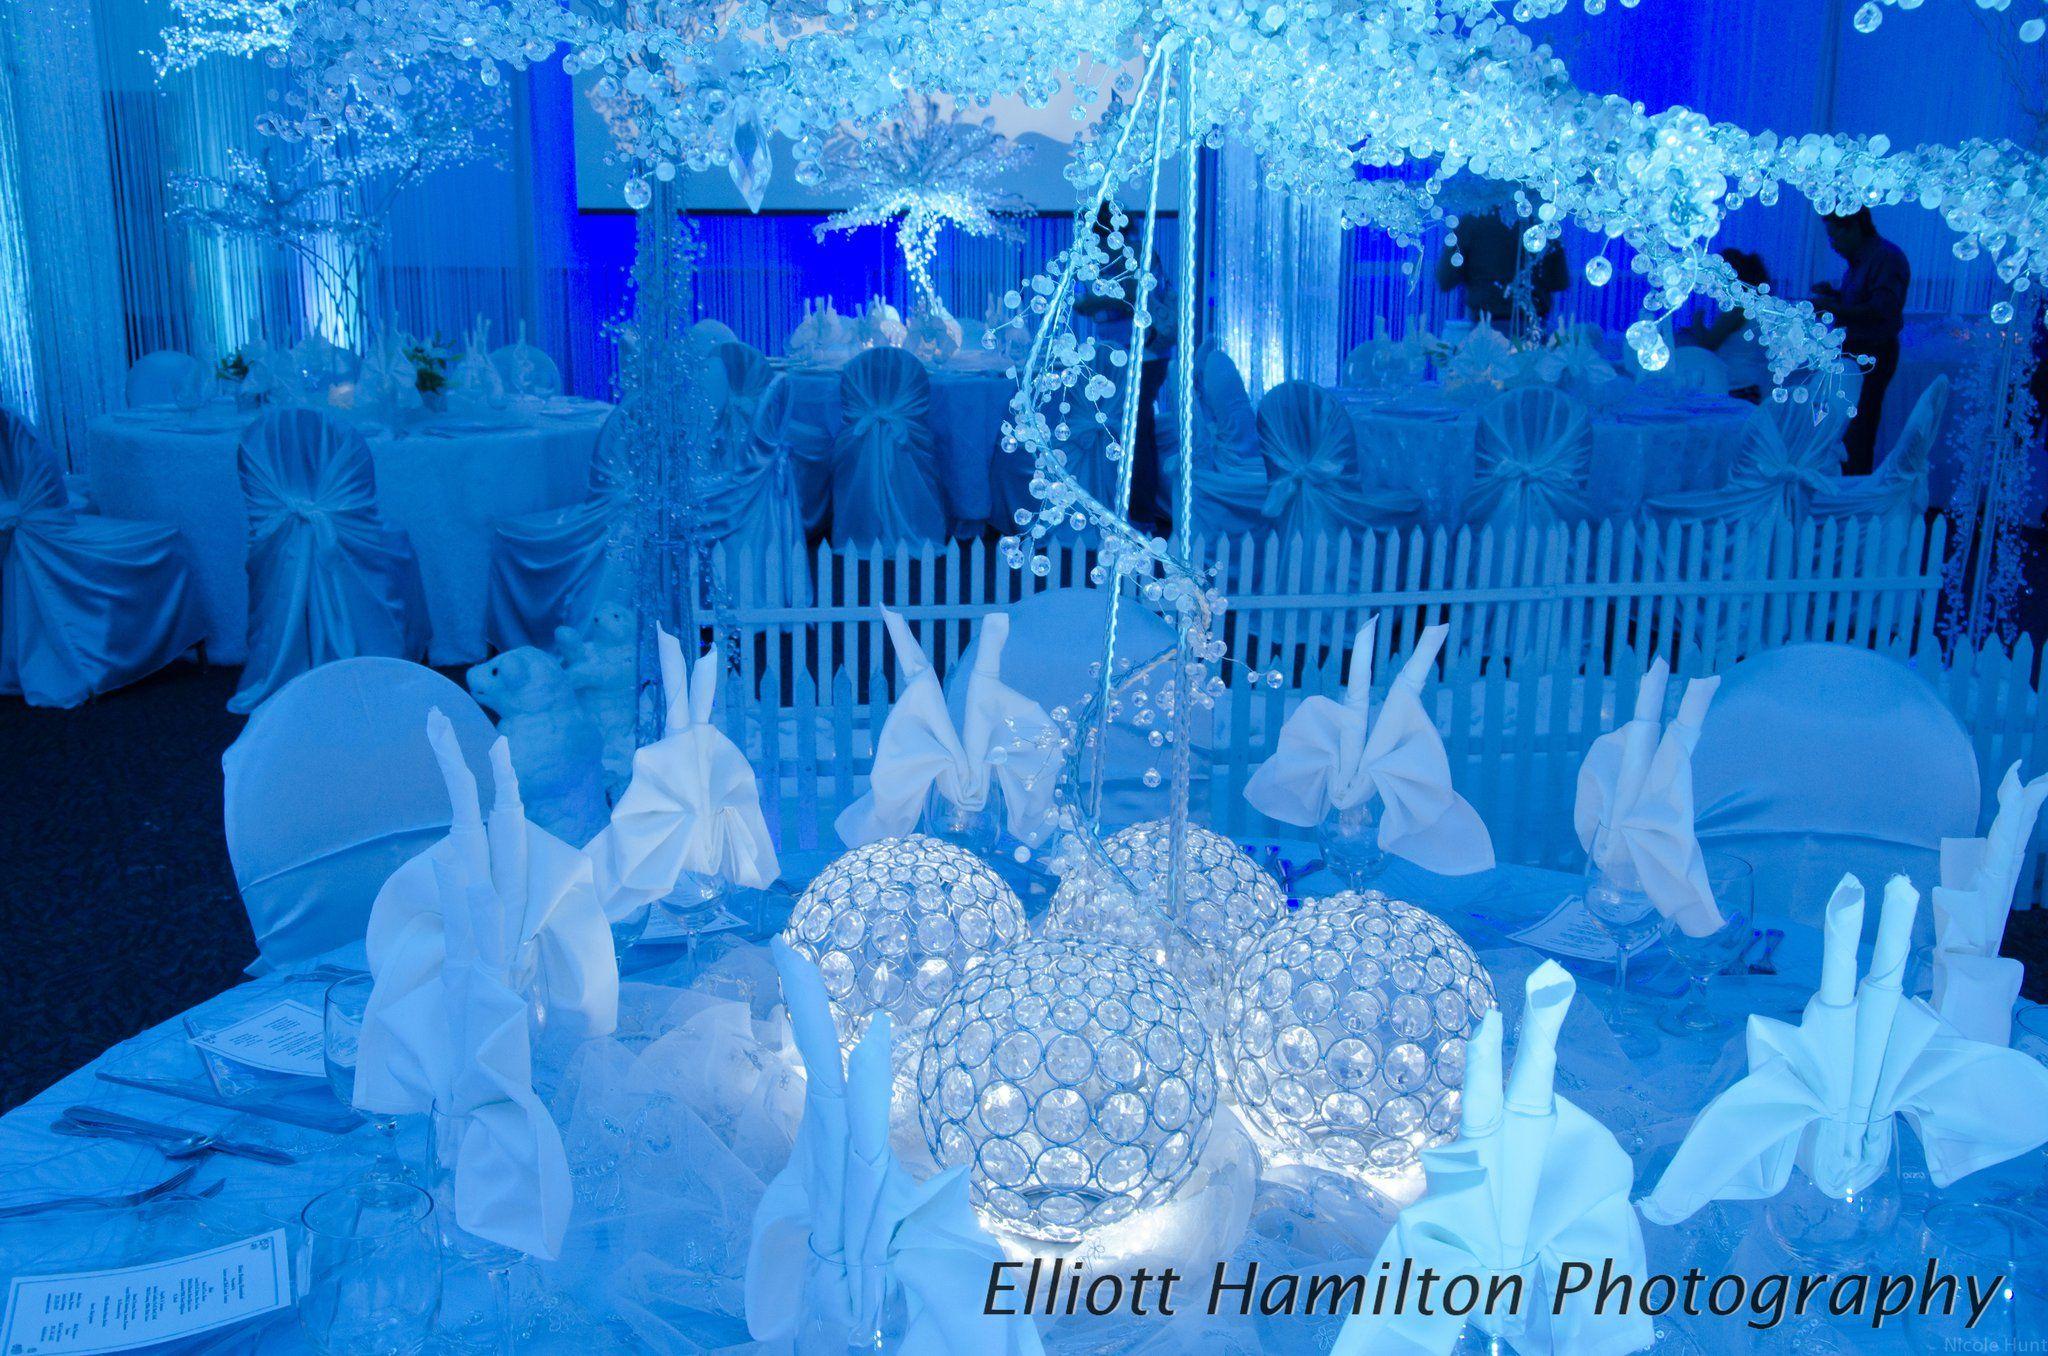 Event Decorations Spectacular Rentals San Antonio Linens Led